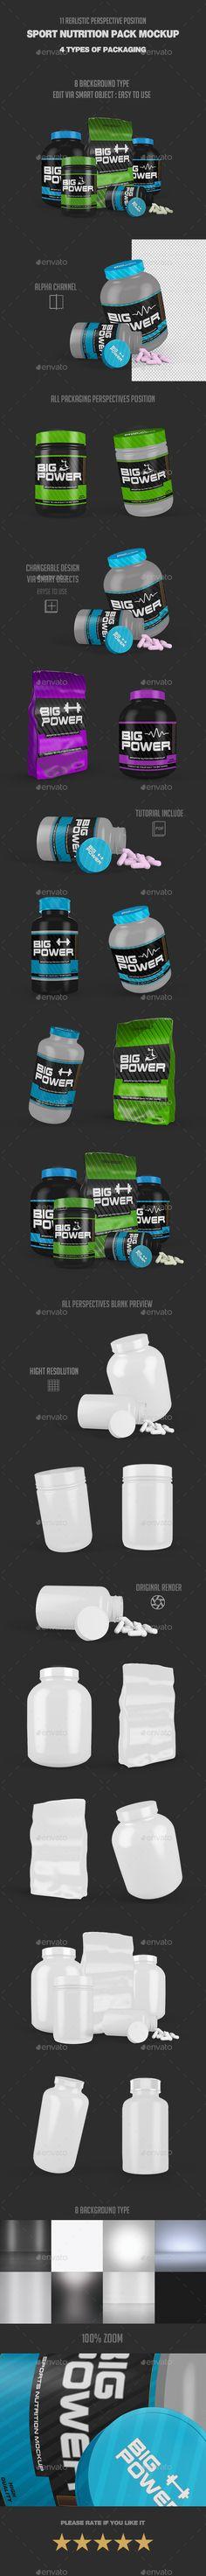 Sport Nutrition Pack Mock Up - #Product #Mock-Ups Graphics